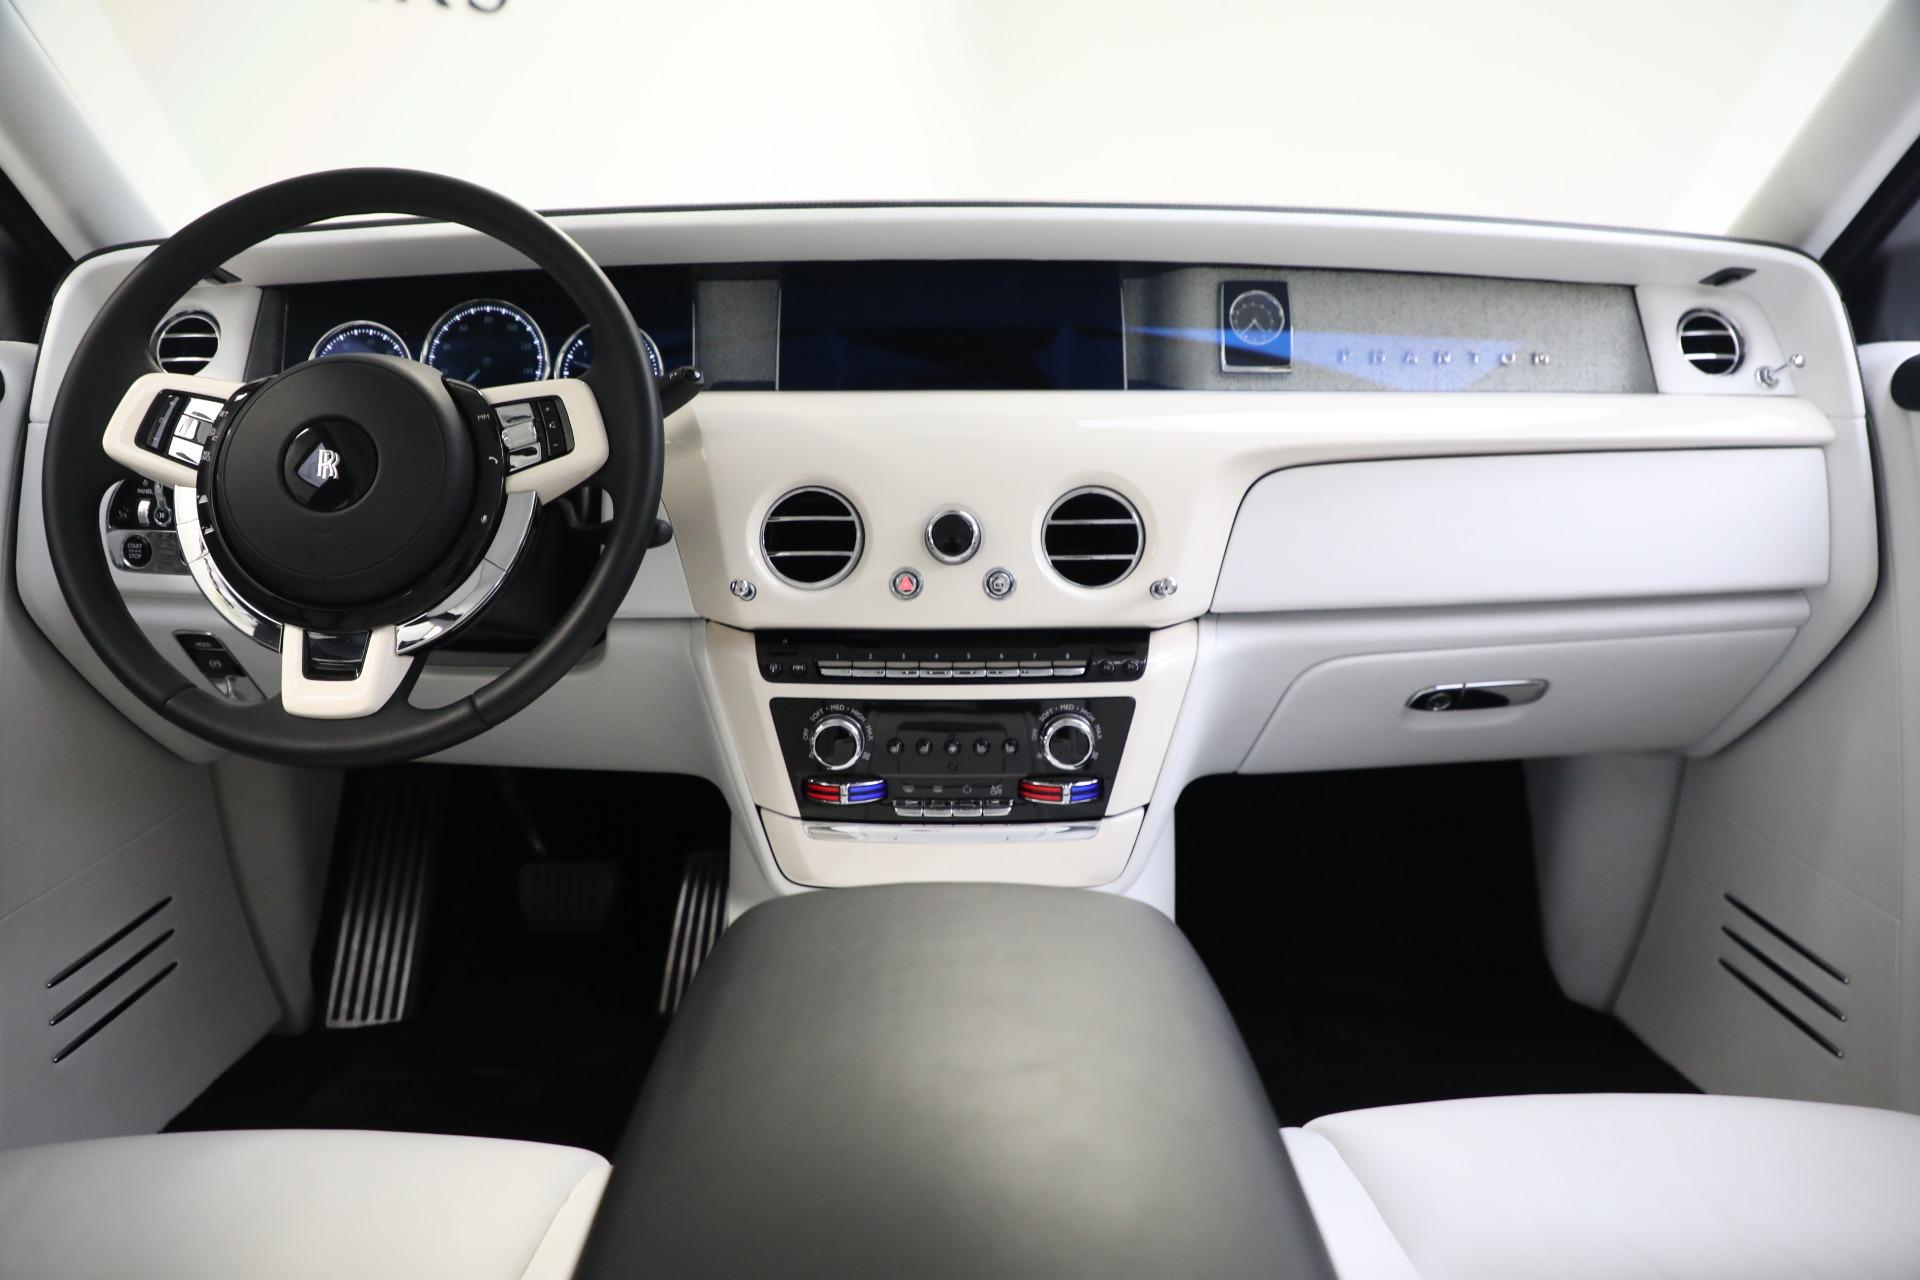 New-2020-Rolls-Royce-Phantom